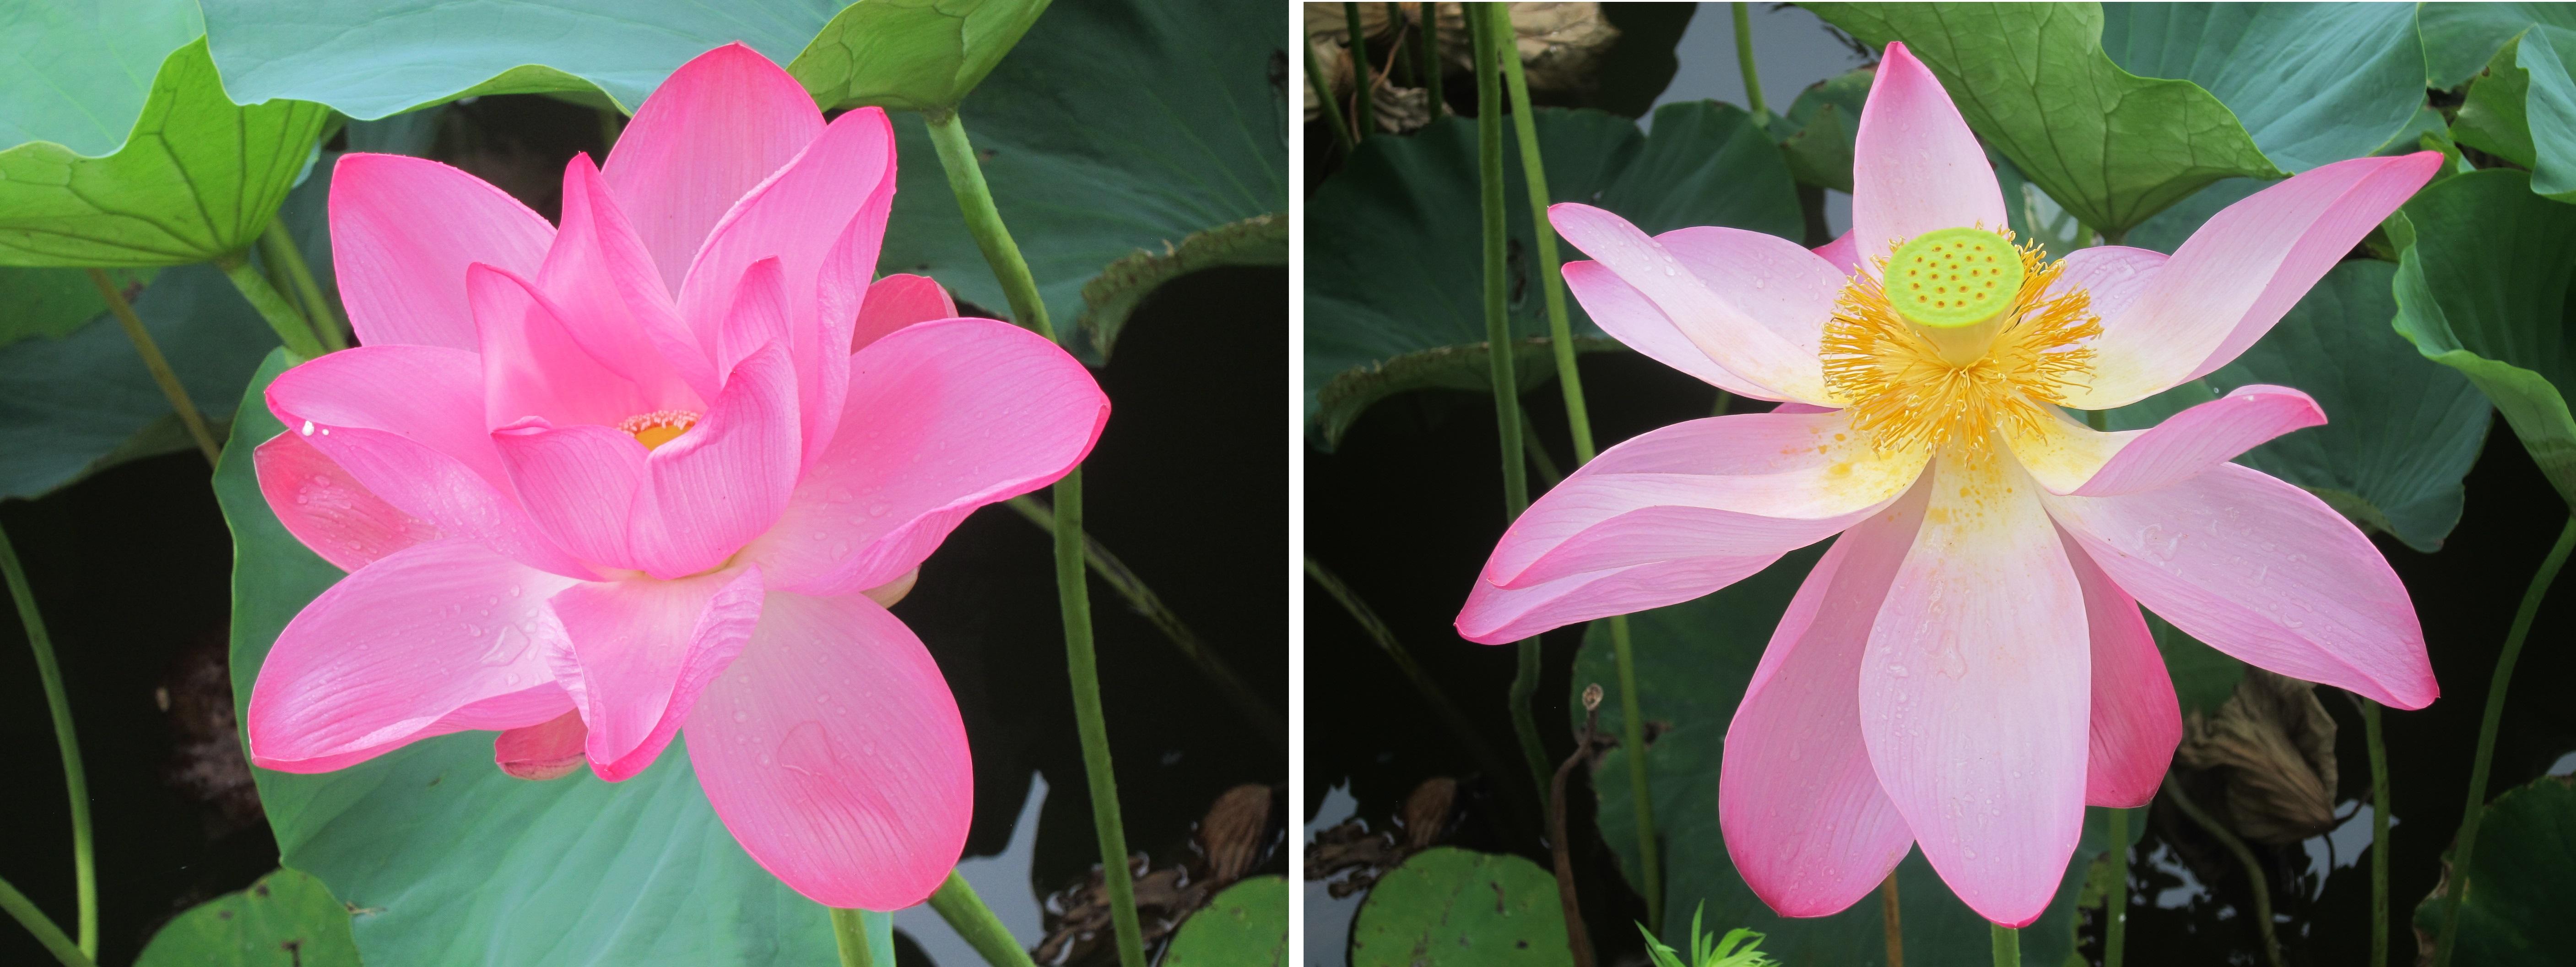 The Beauty Of Japan Seasonal Flowers Part 2 Odigo